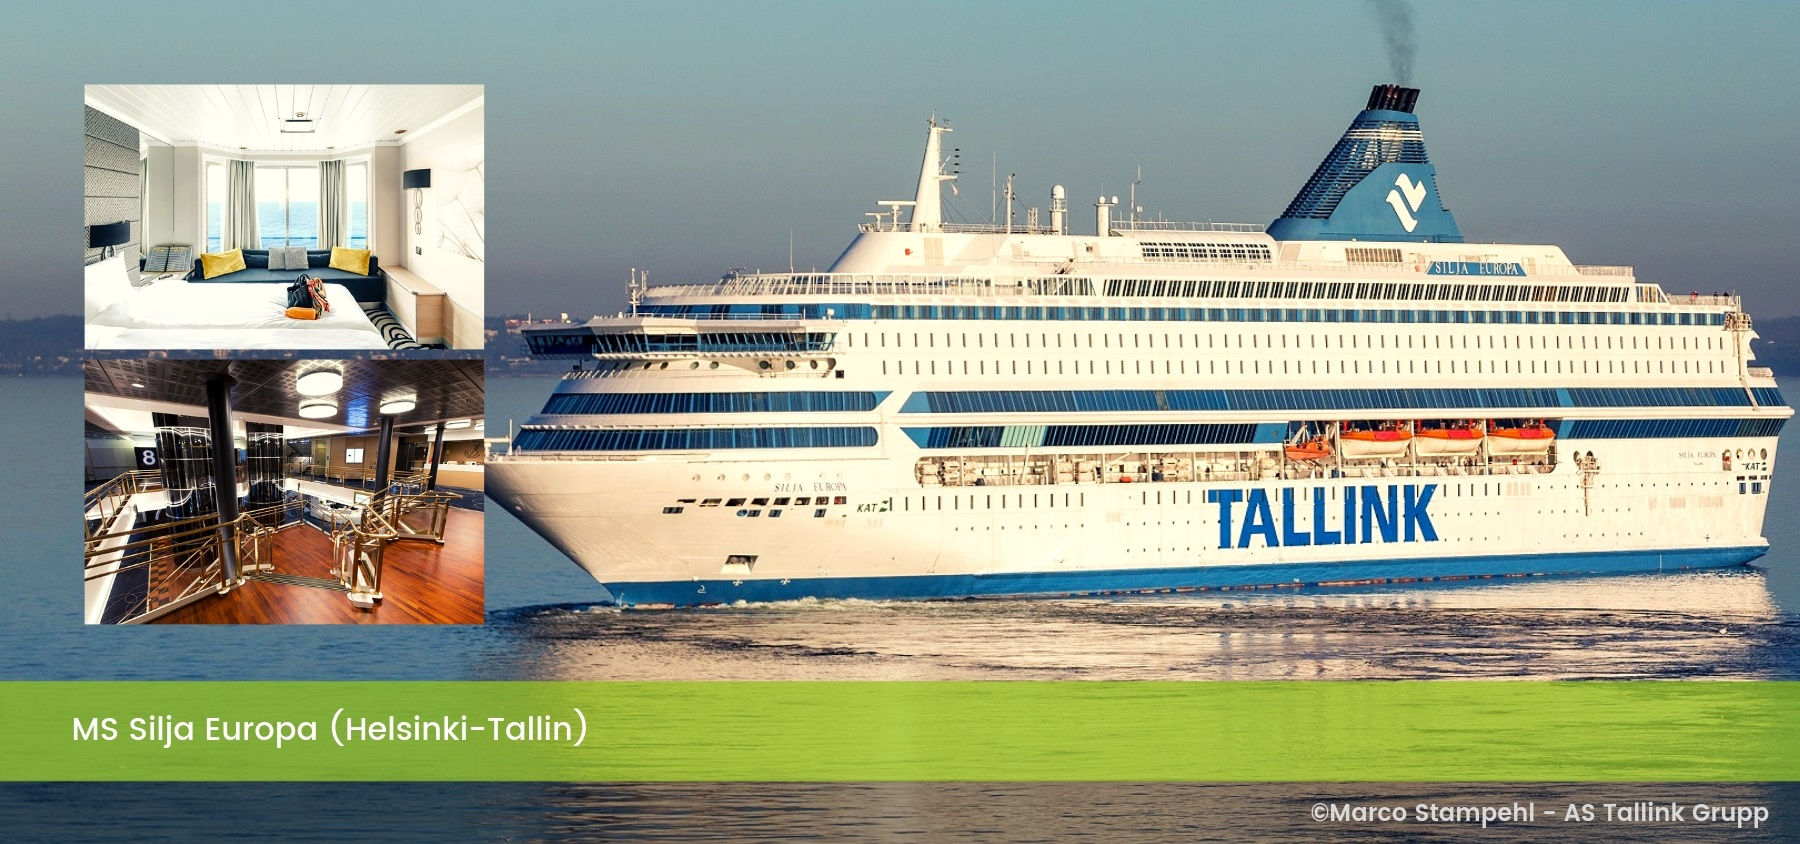 Ms Silja Europa (Helsinki-Tallin)